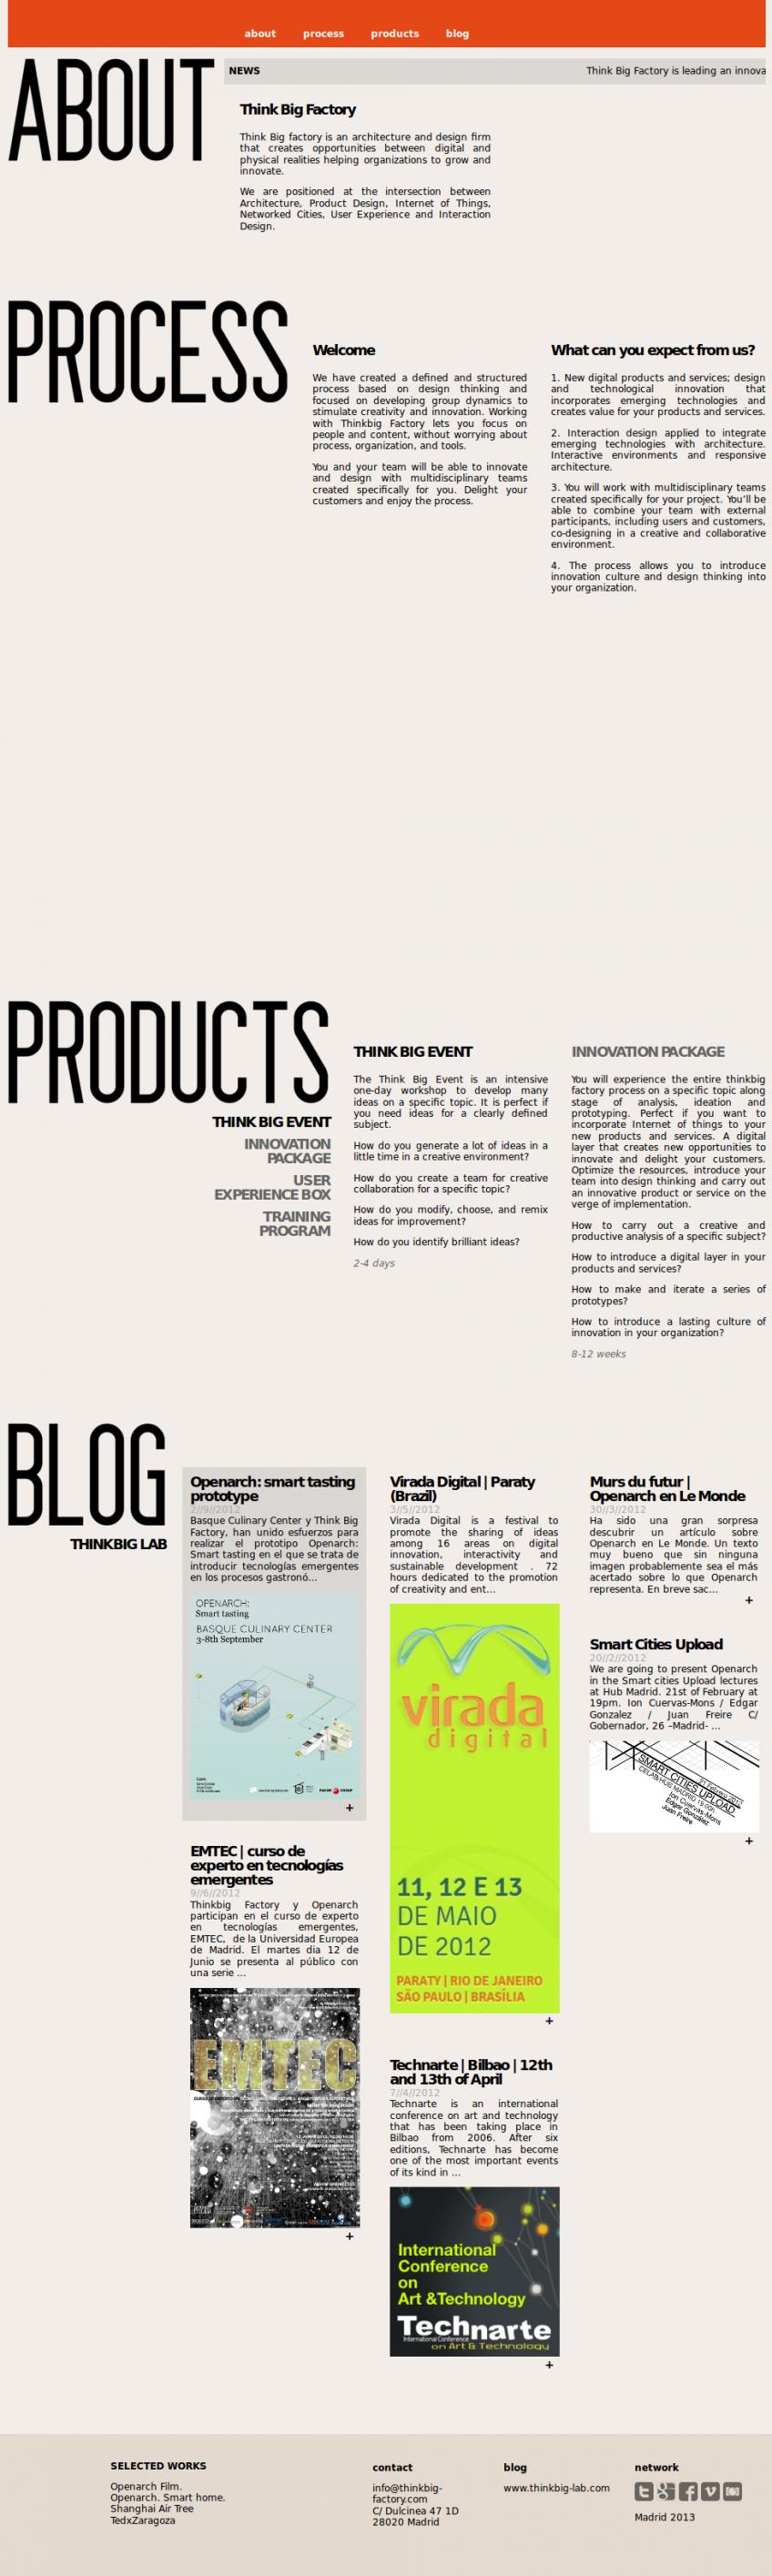 Página completa de Think Big Factory